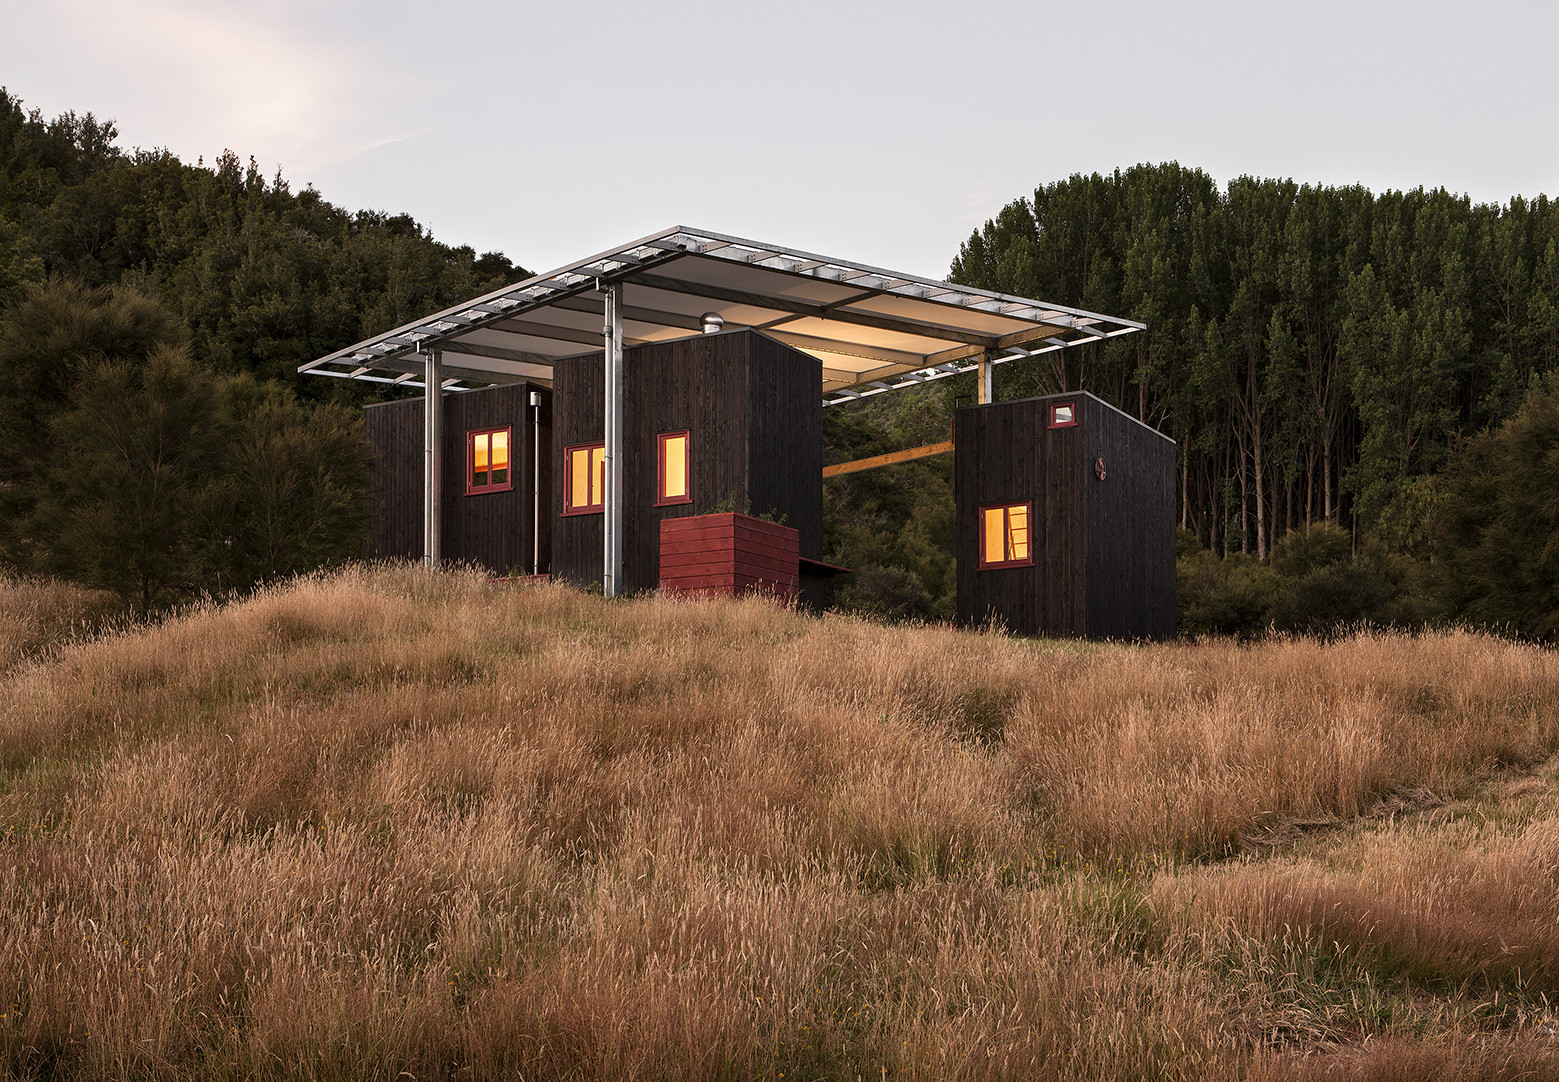 Longbush Ecosanctuary Welcome Shelter / Sarosh Mulla Design, © Simon Devitt